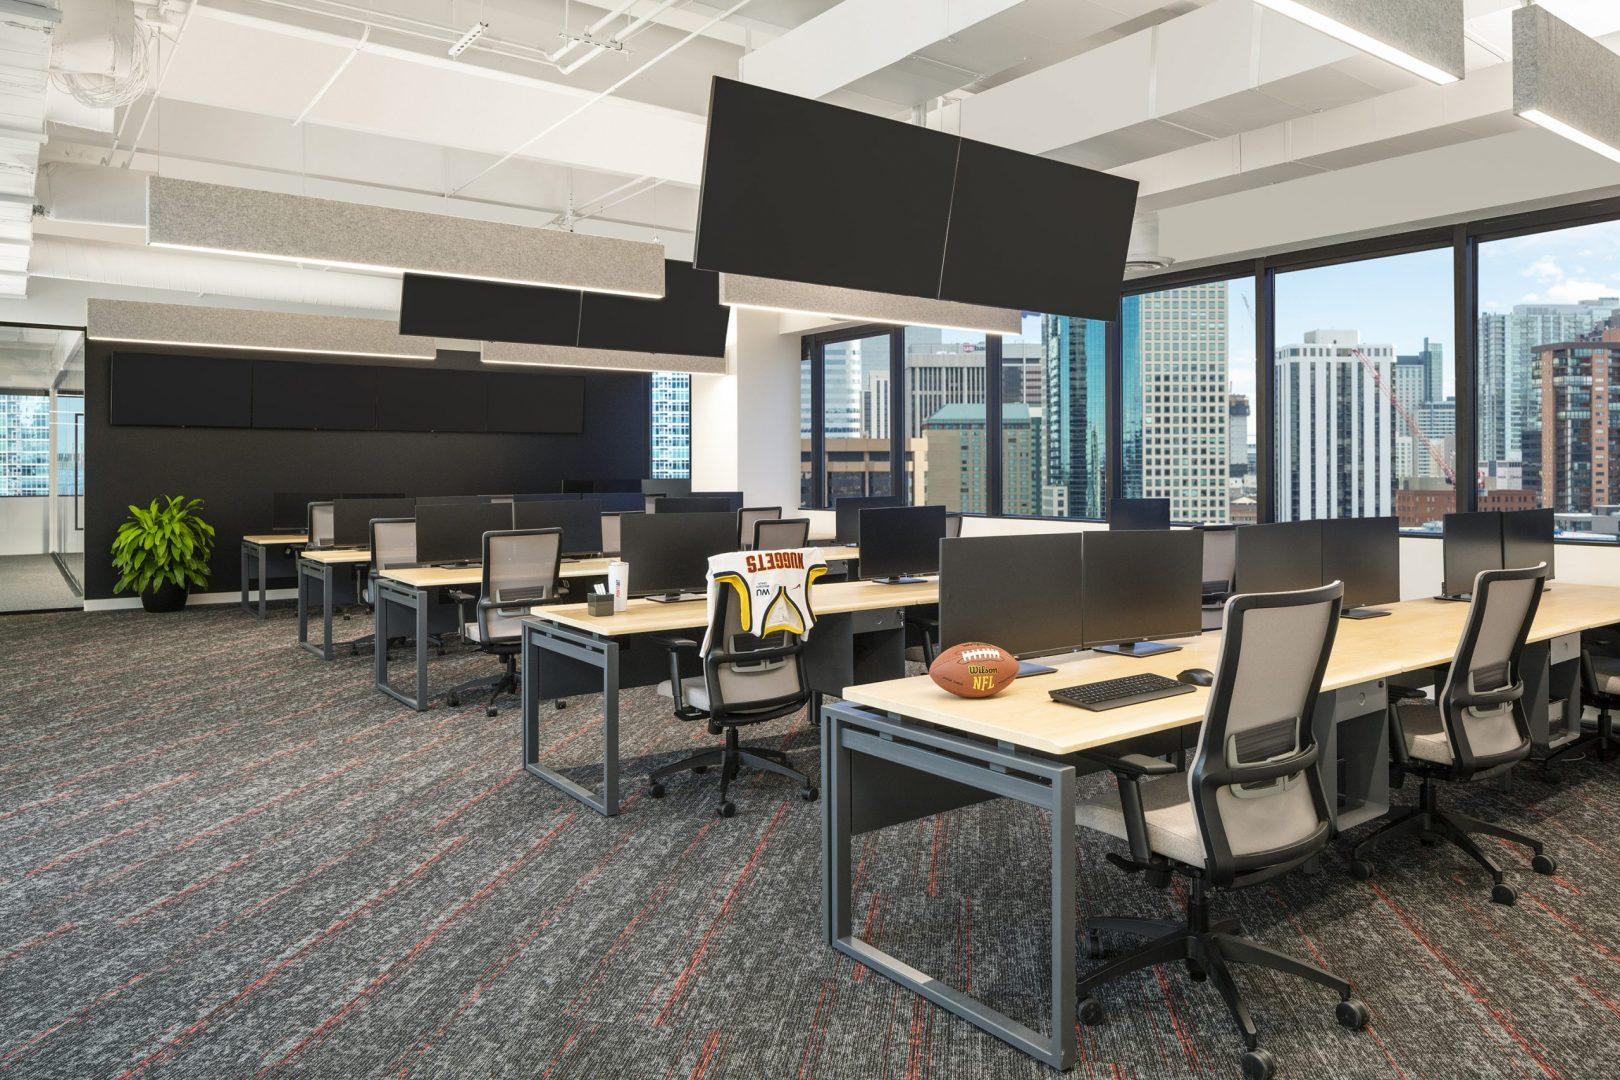 POINTSBET Corporate Interior Design Open Office